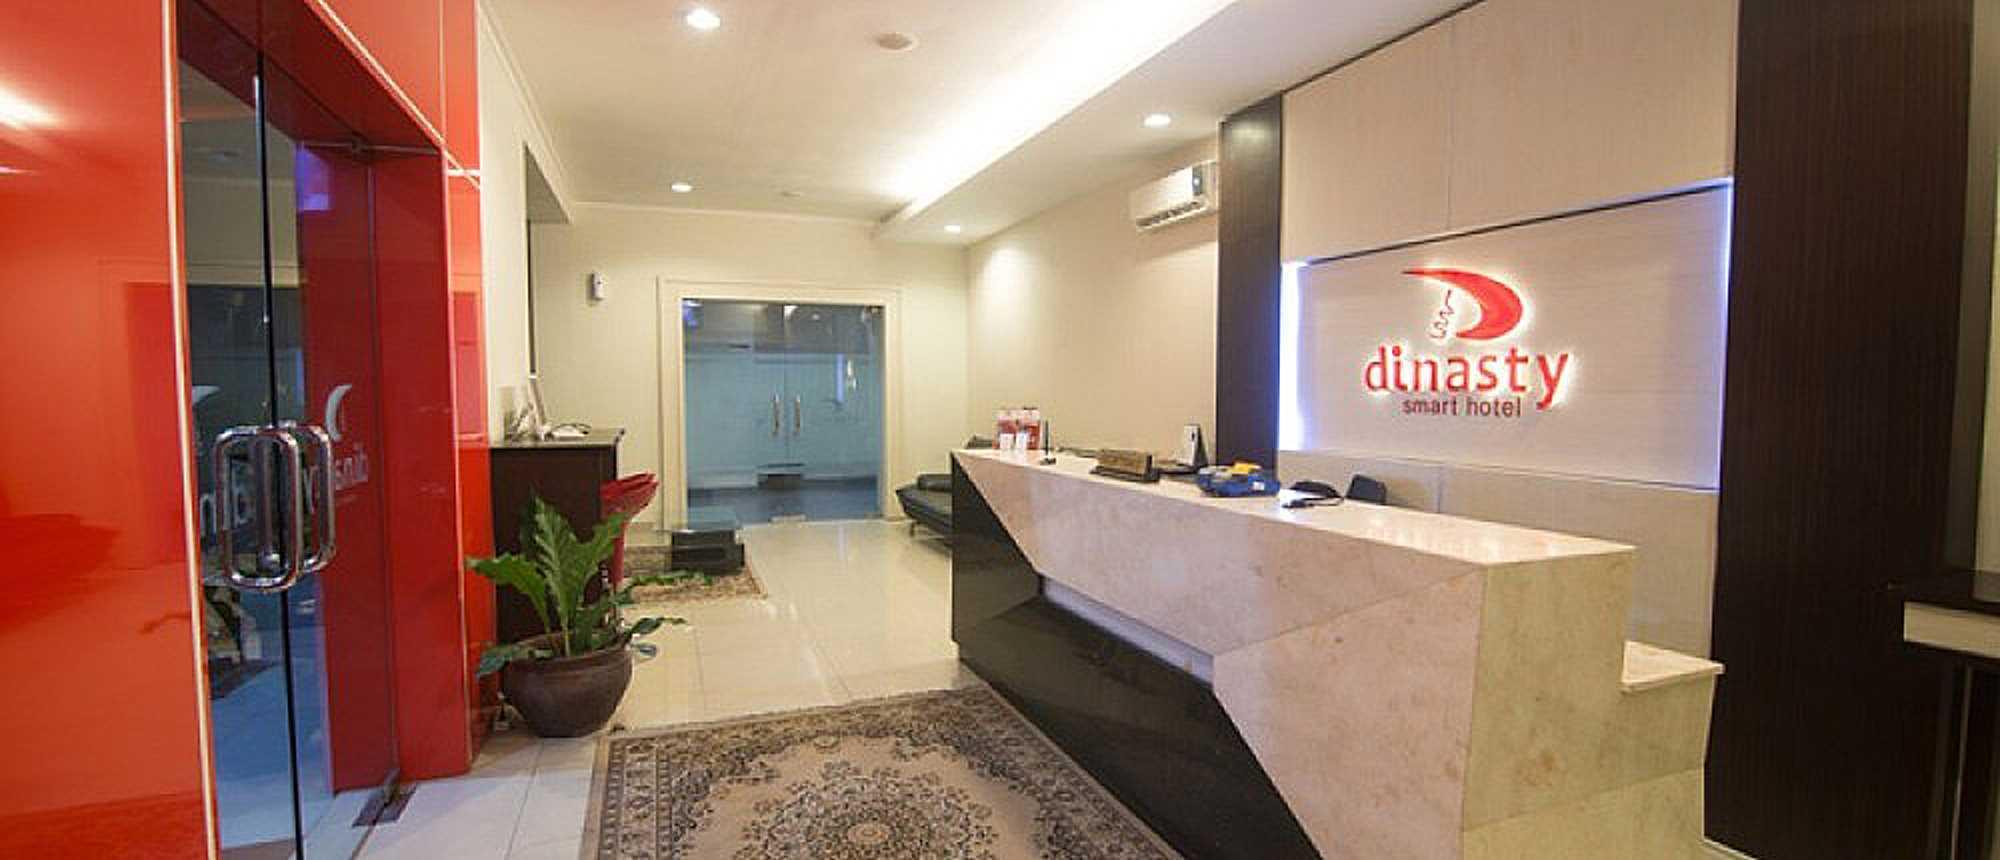 Archidium Make Over Fasade Dinasty Hotel - Solo Surakarta, Kota Surakarta, Jawa Tengah, Indonesia Surakarta, Kota Surakarta, Jawa Tengah, Indonesia Archidium-Make-Over-Fasade-Dinasty-Hotel-Solo  72072